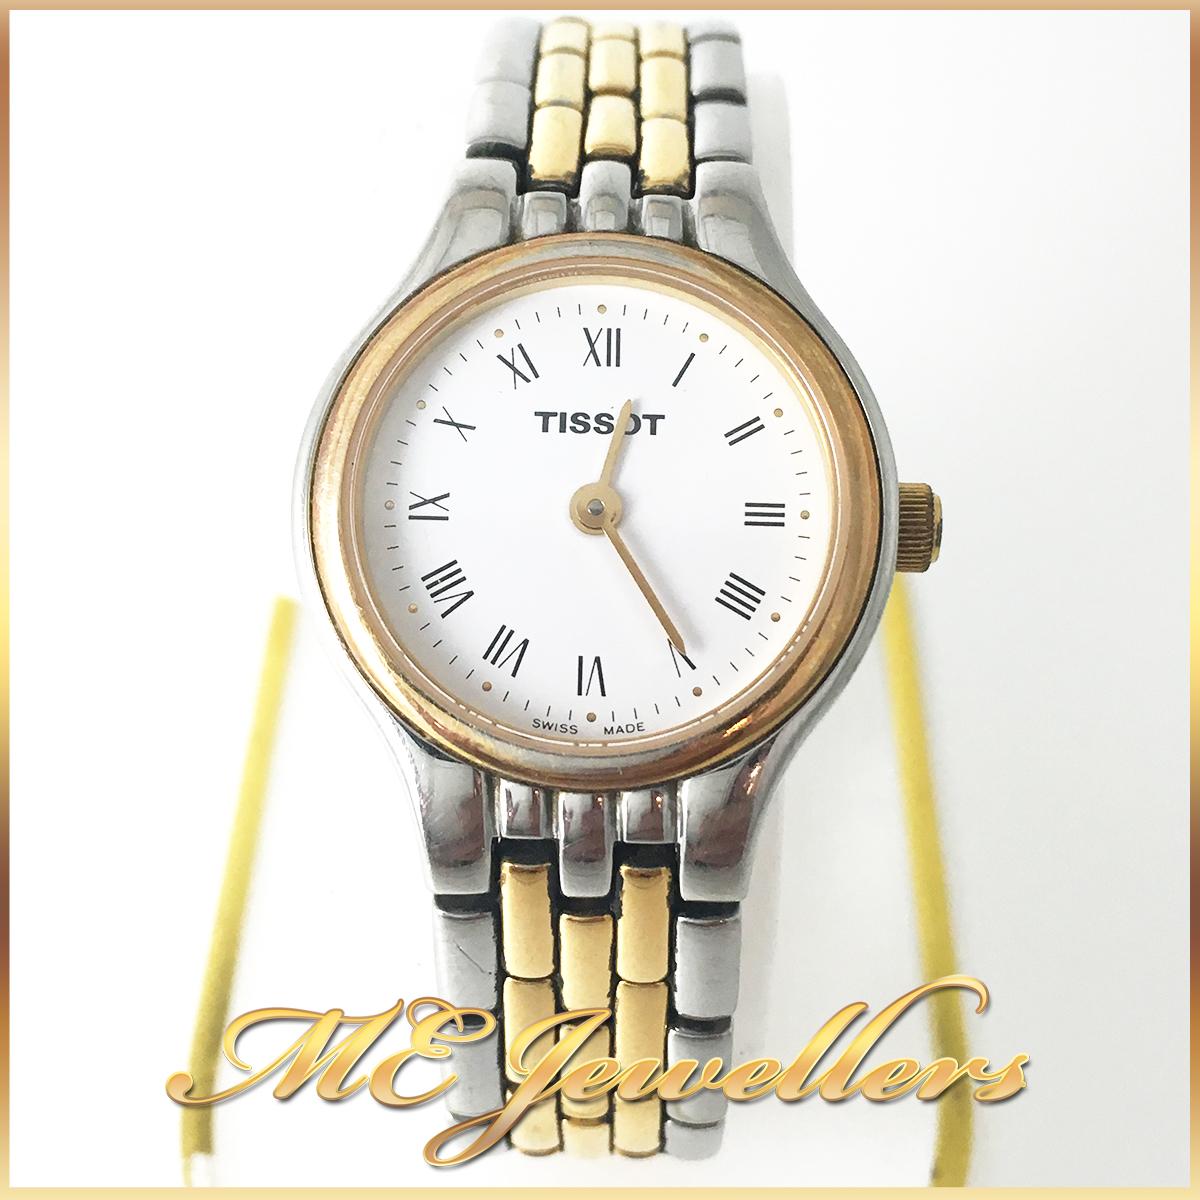 Tissot 2 tone watch